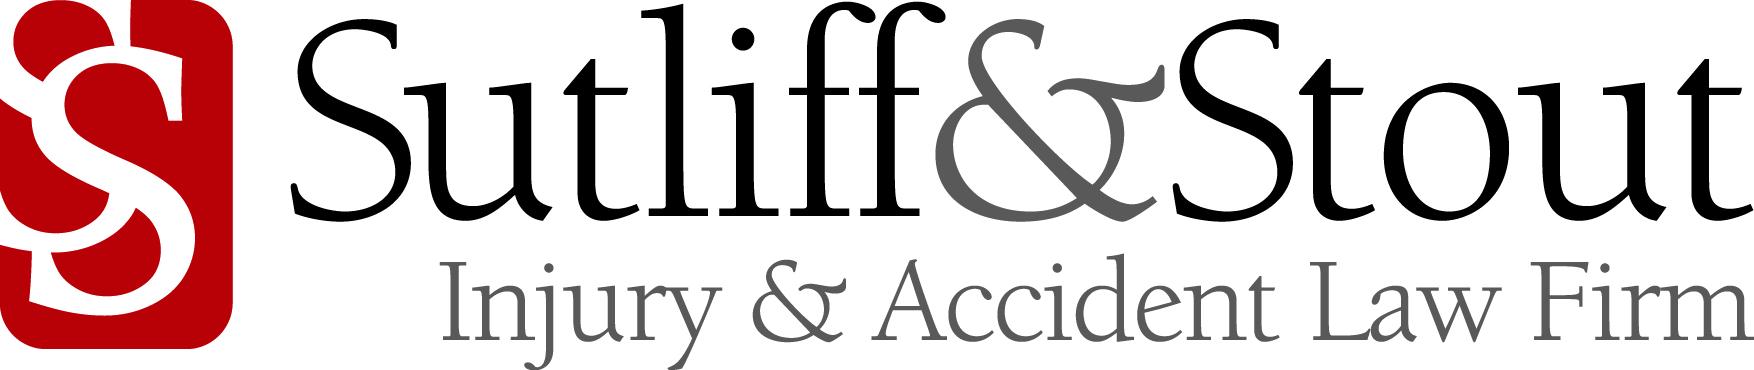 Sutliff Stout Logo